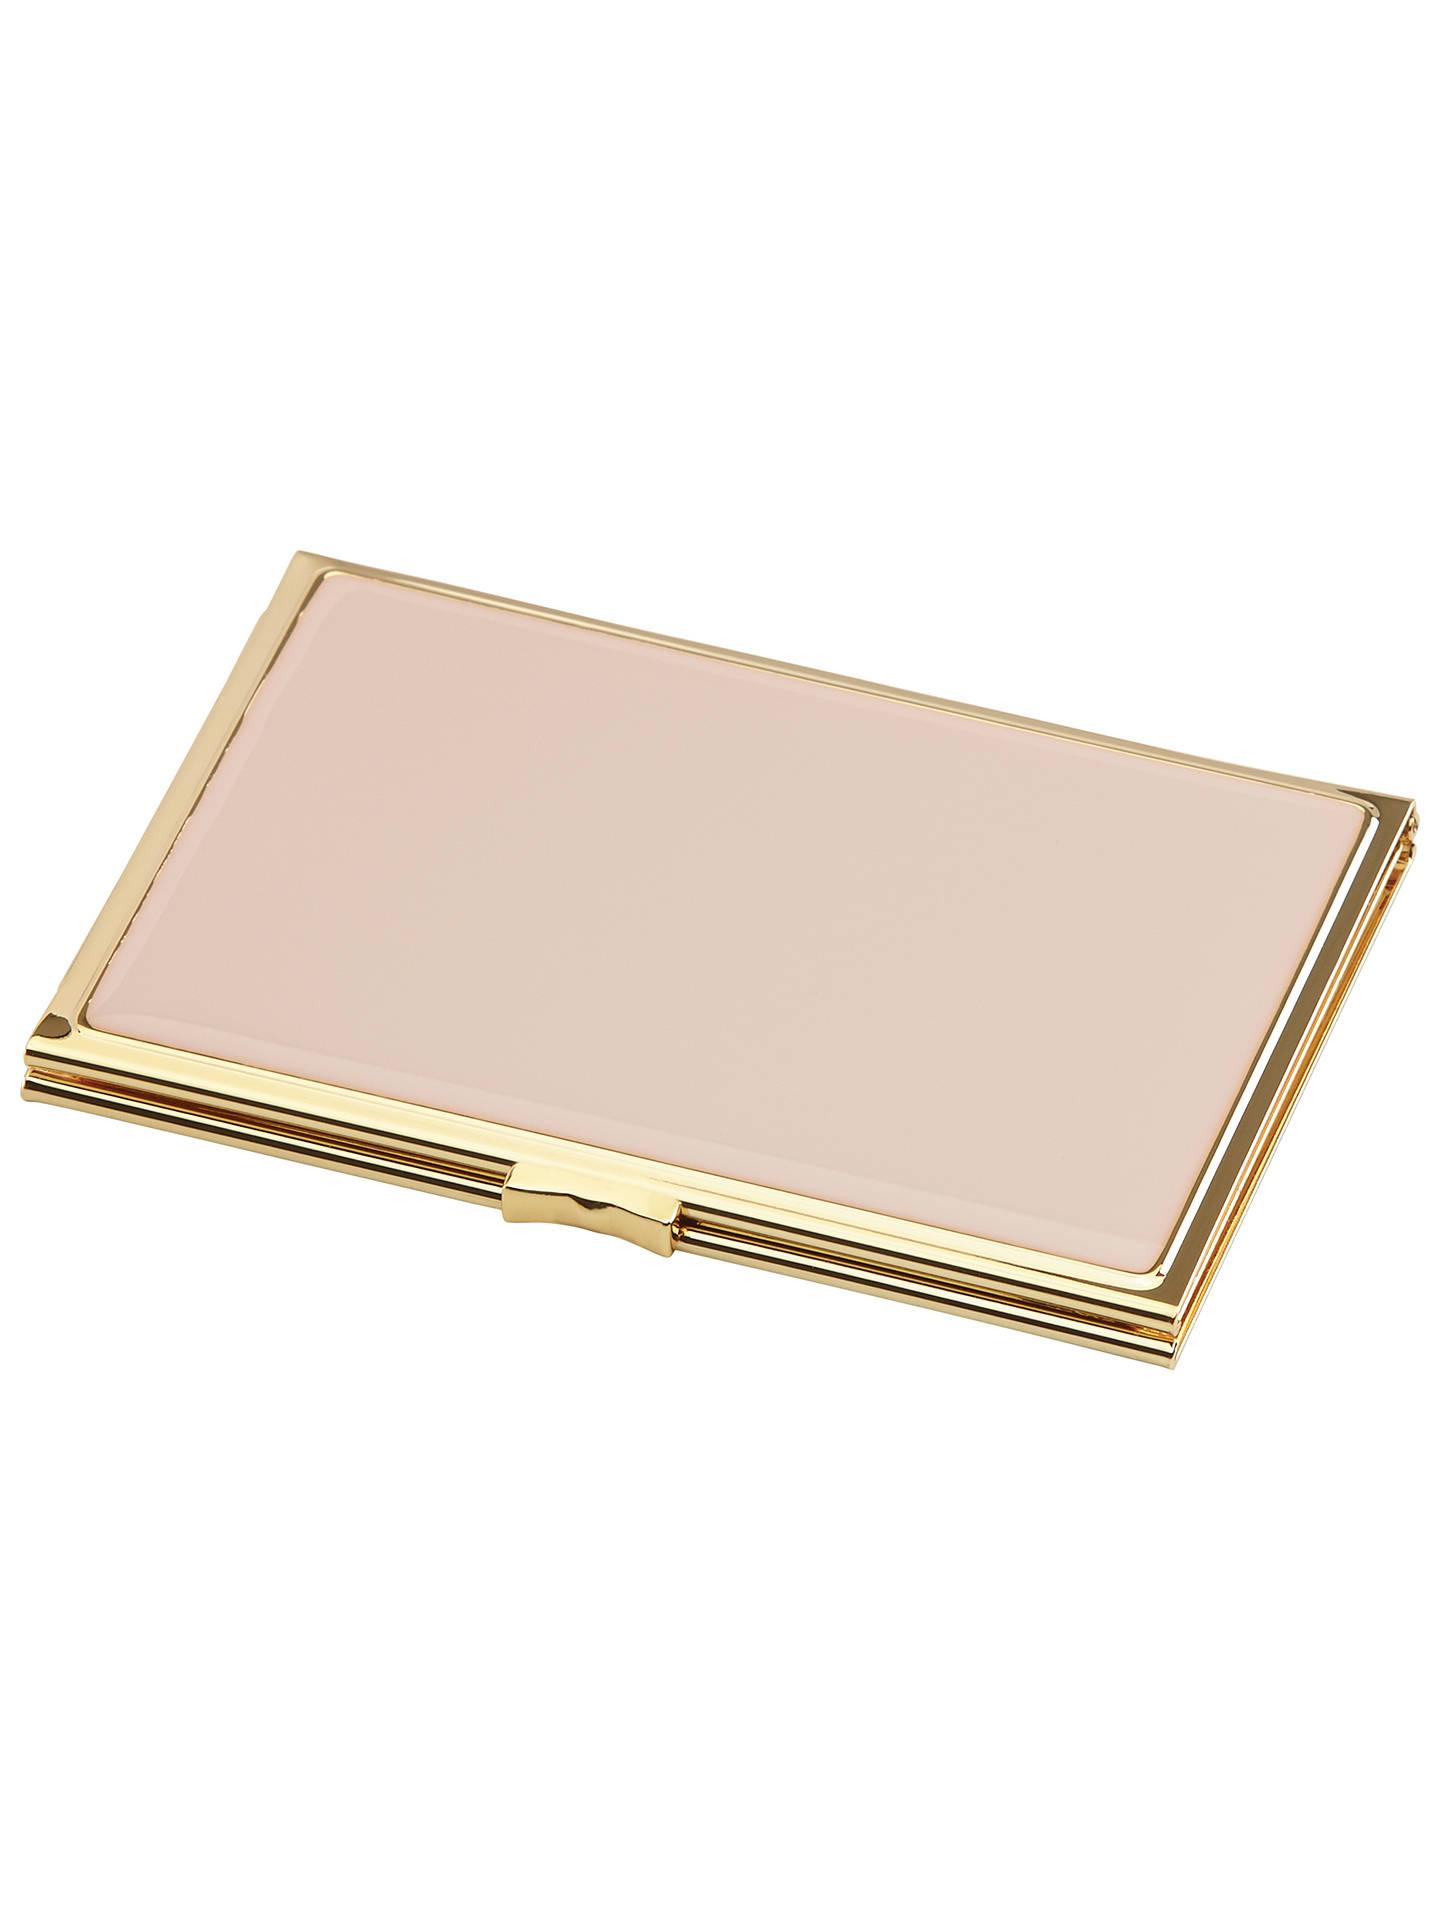 Kate Spade New York Hinged Pocket Frame 25 X 35 Pink At John